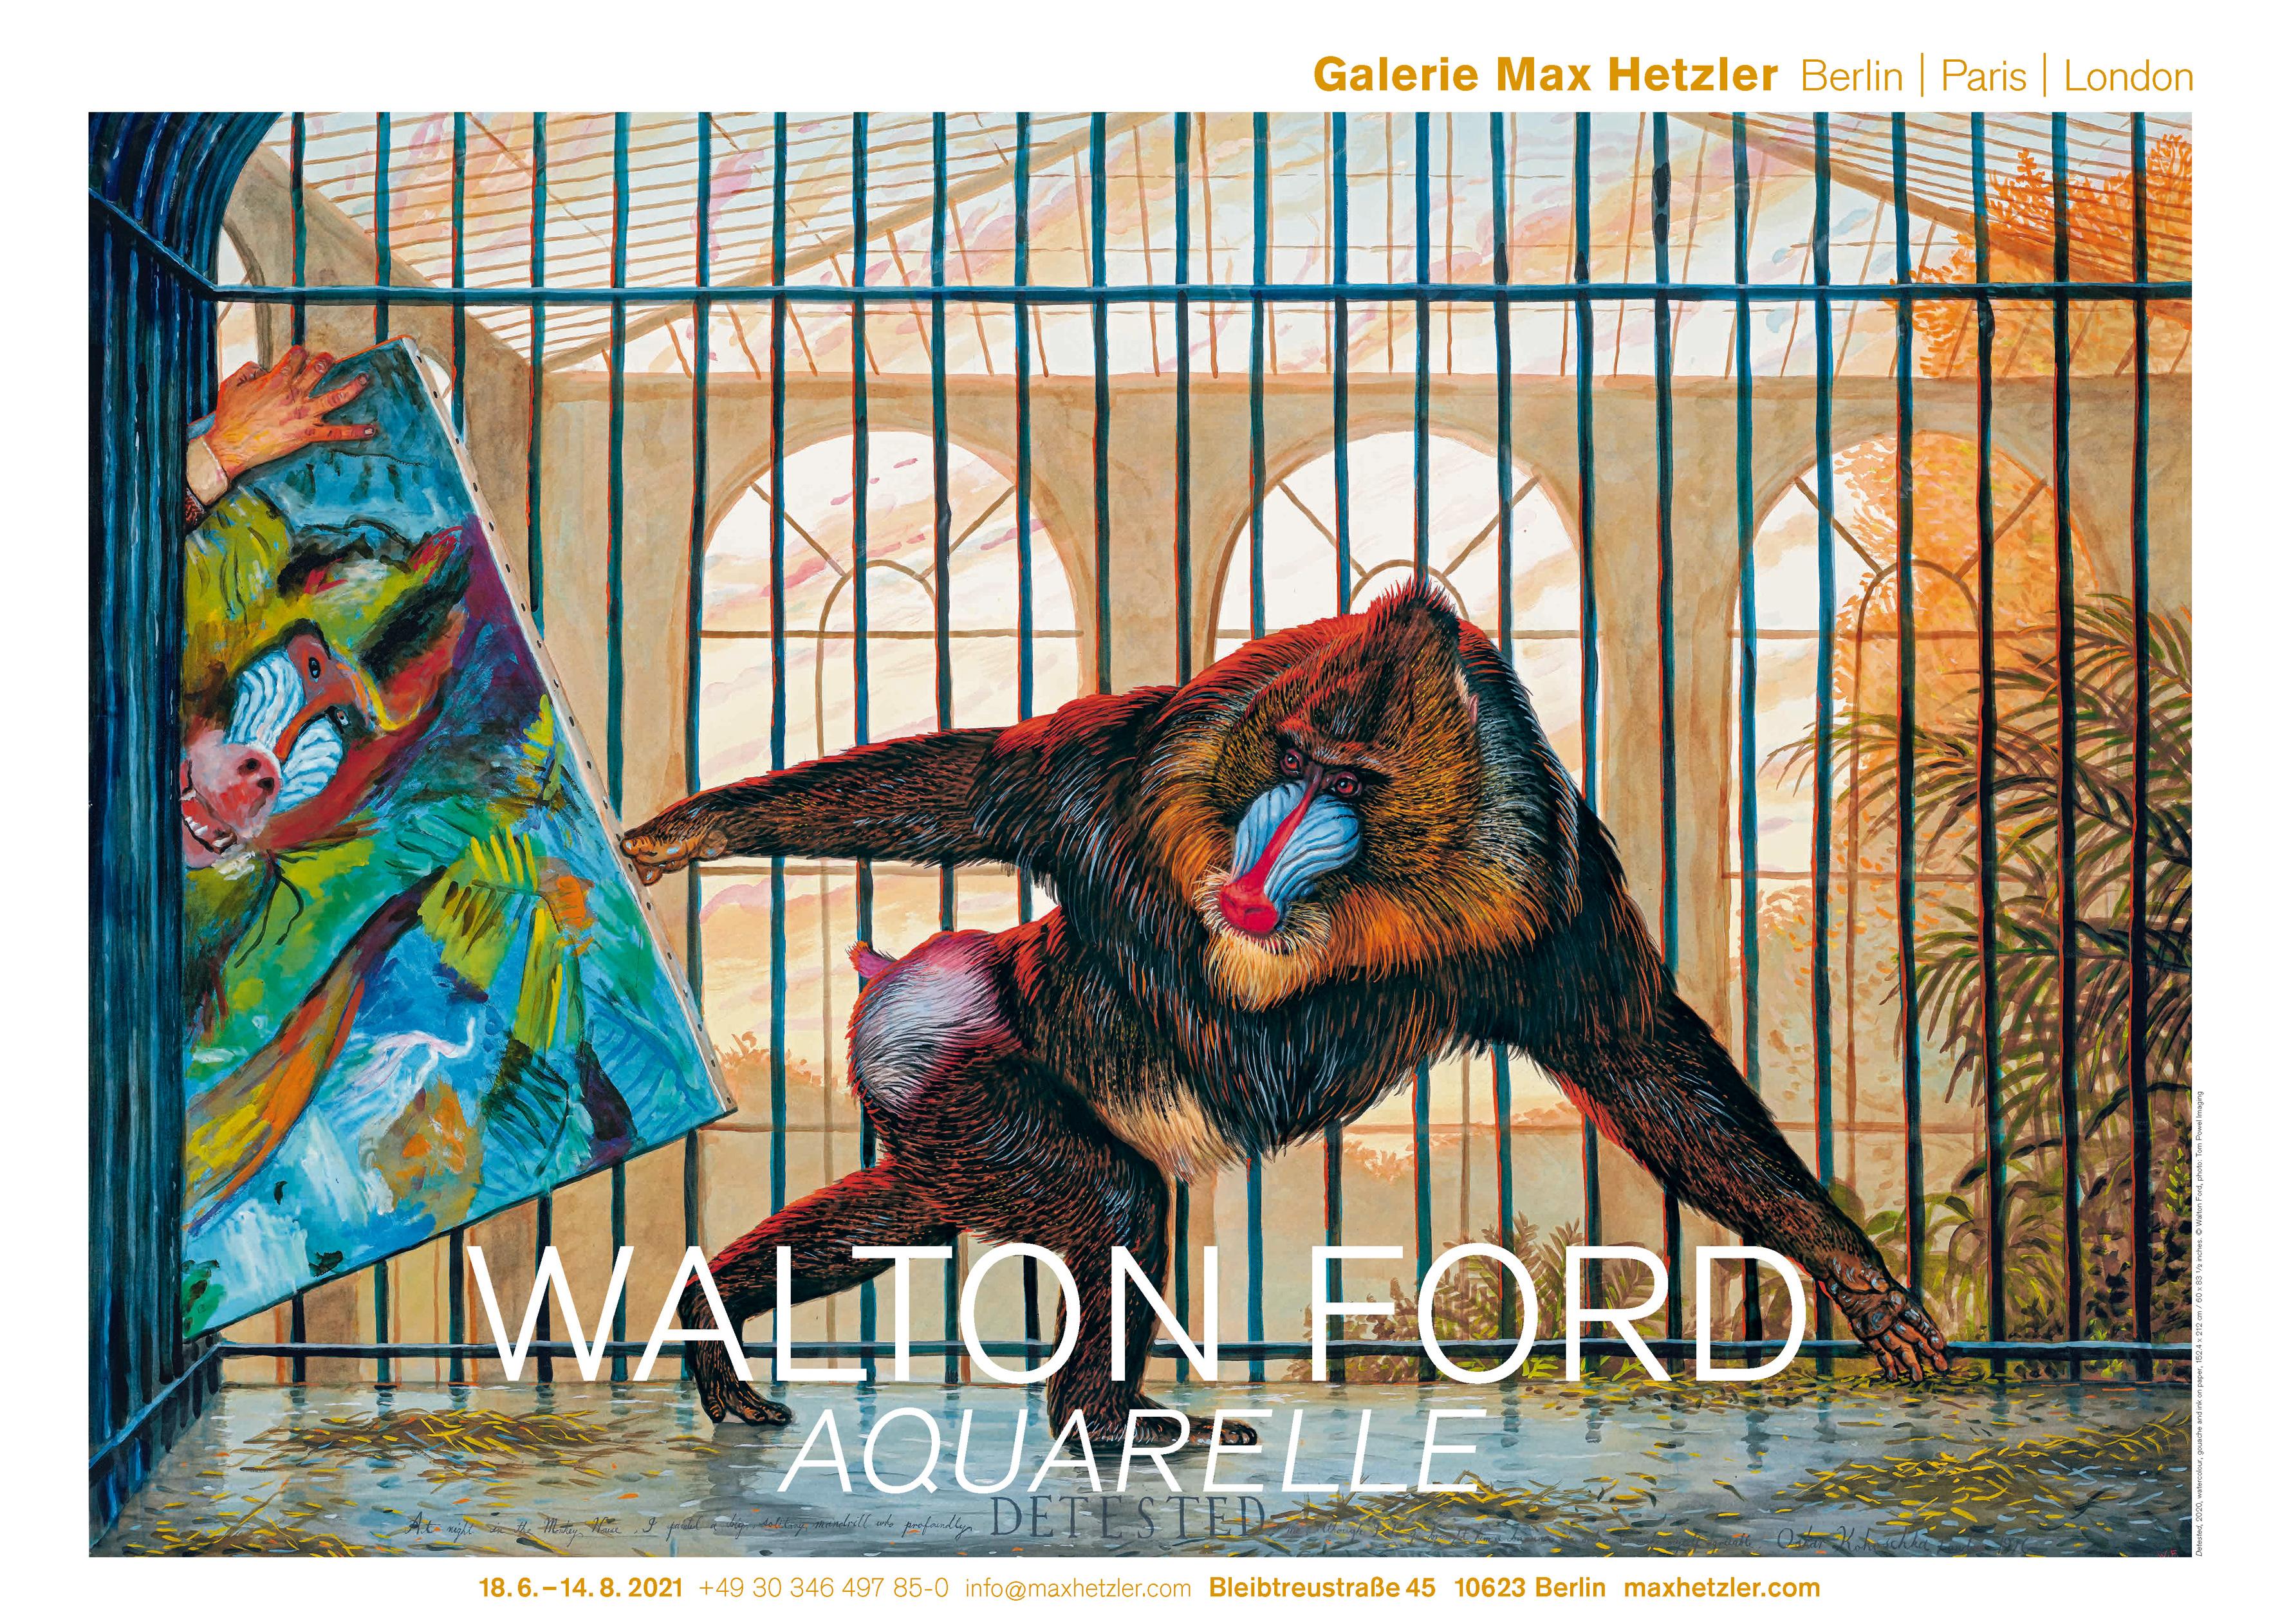 Walton Ford, Aquarelle - Galerie Max Hetzler